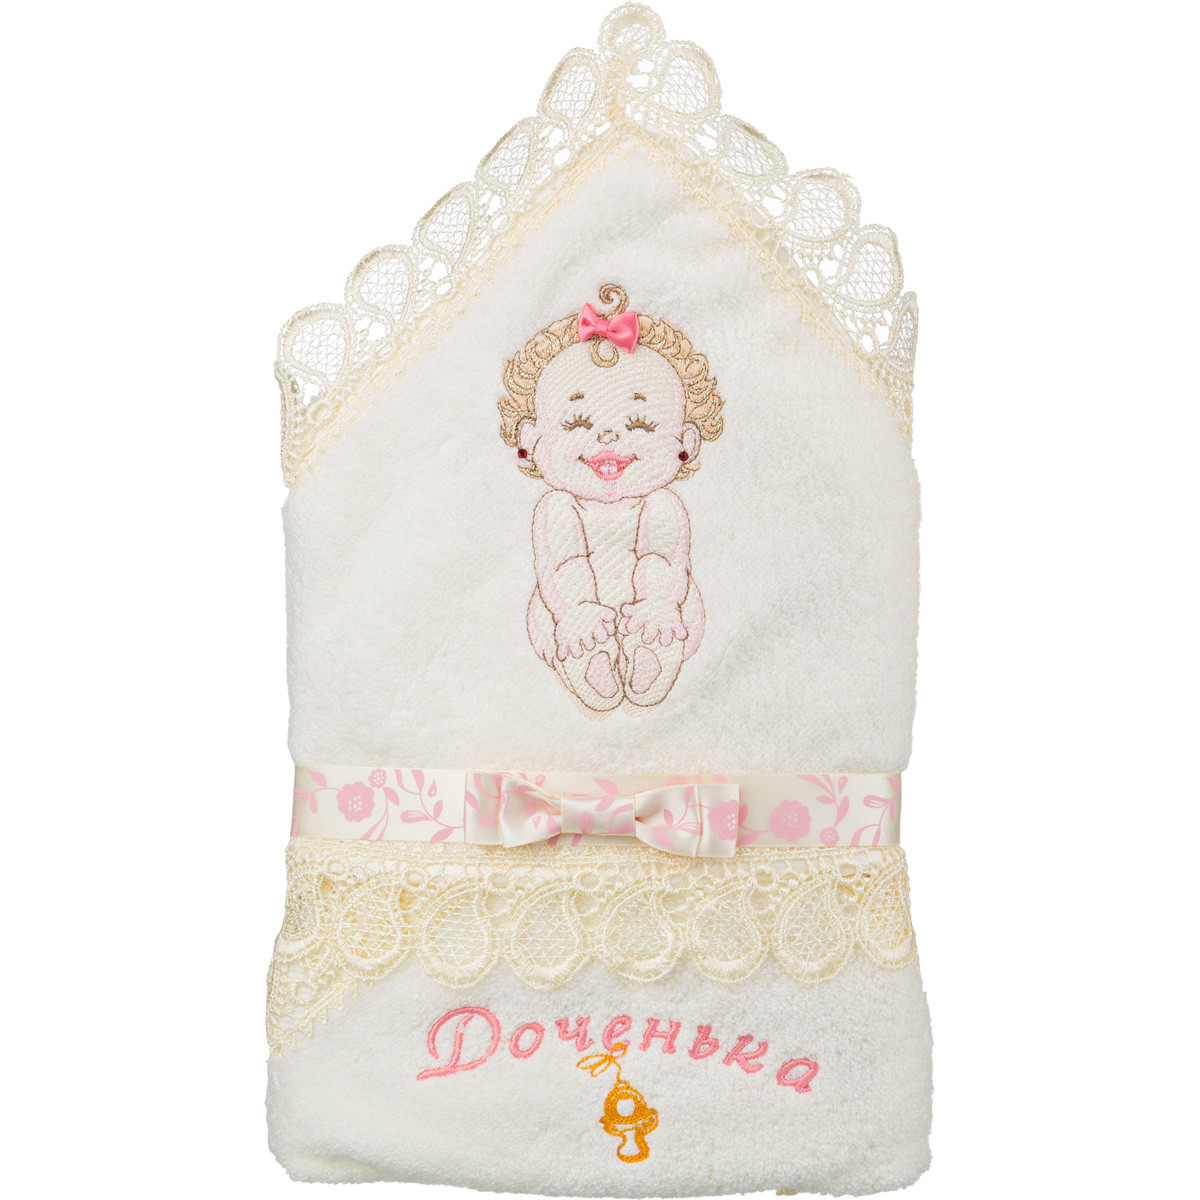 Полотенца Santalino Детское полотенце Jennie  (70х70 см) bravo полотенце детское пони 33 x 70 см 1089